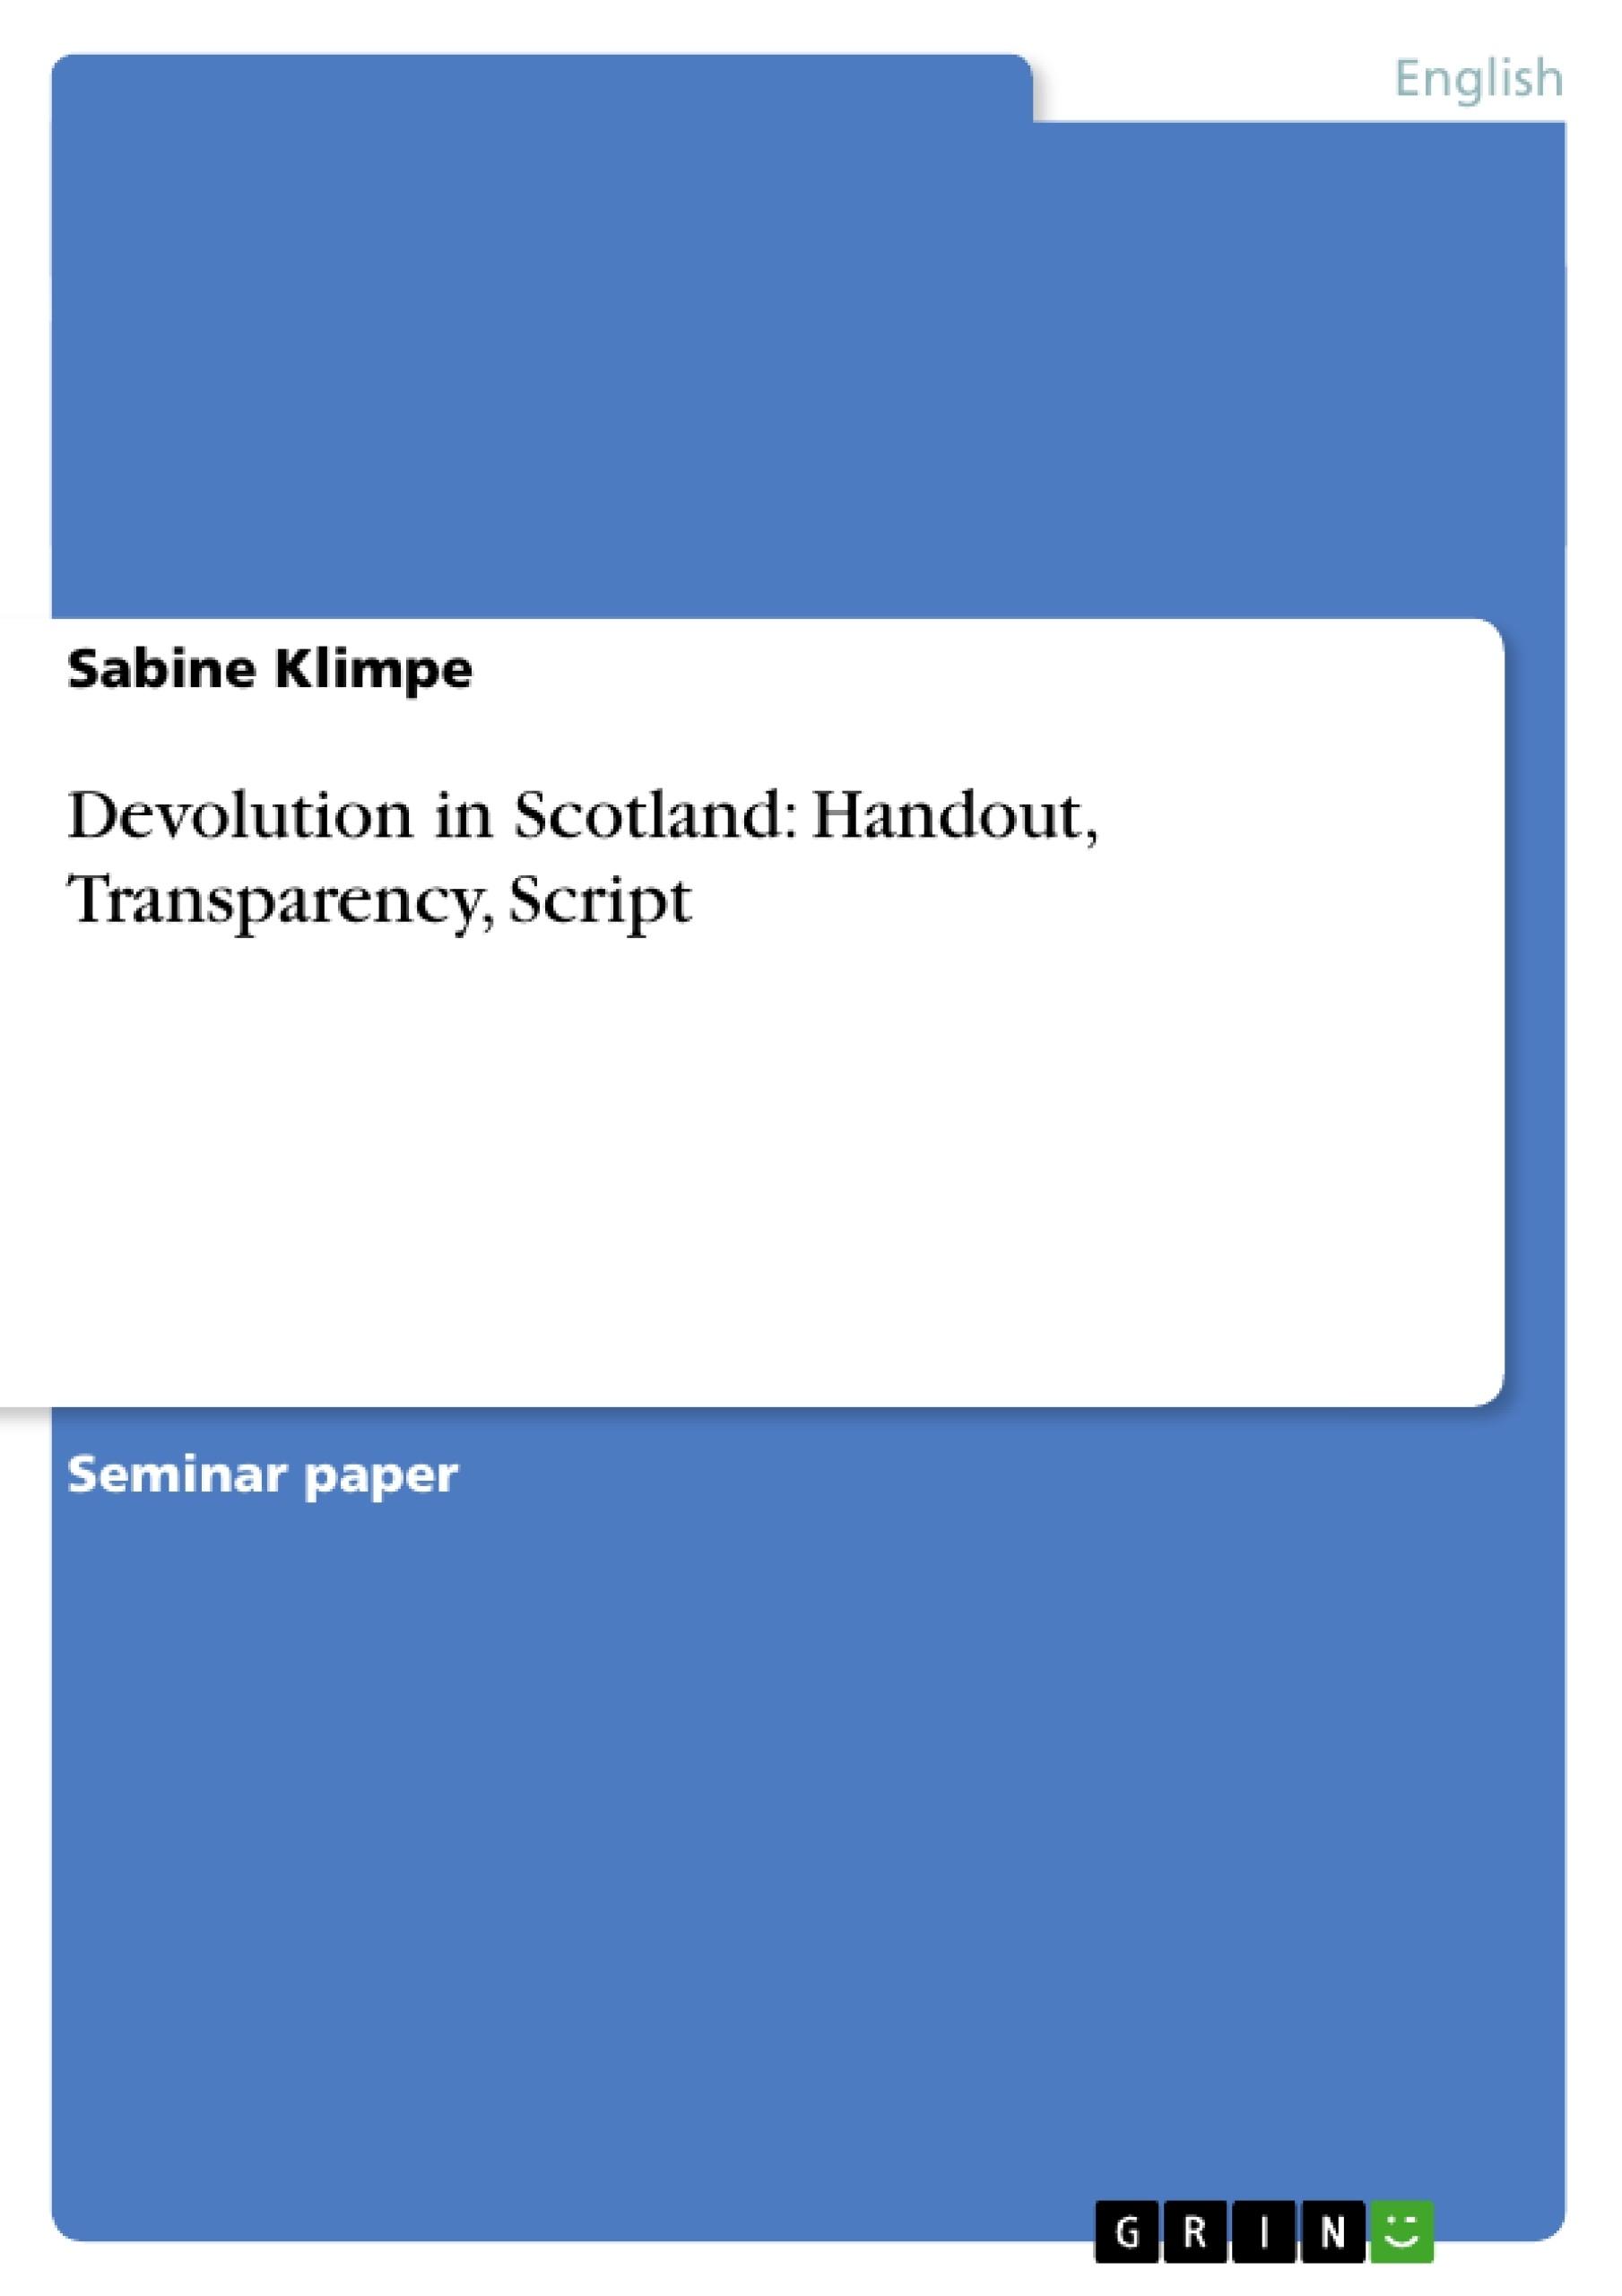 Title: Devolution in Scotland: Handout, Transparency, Script